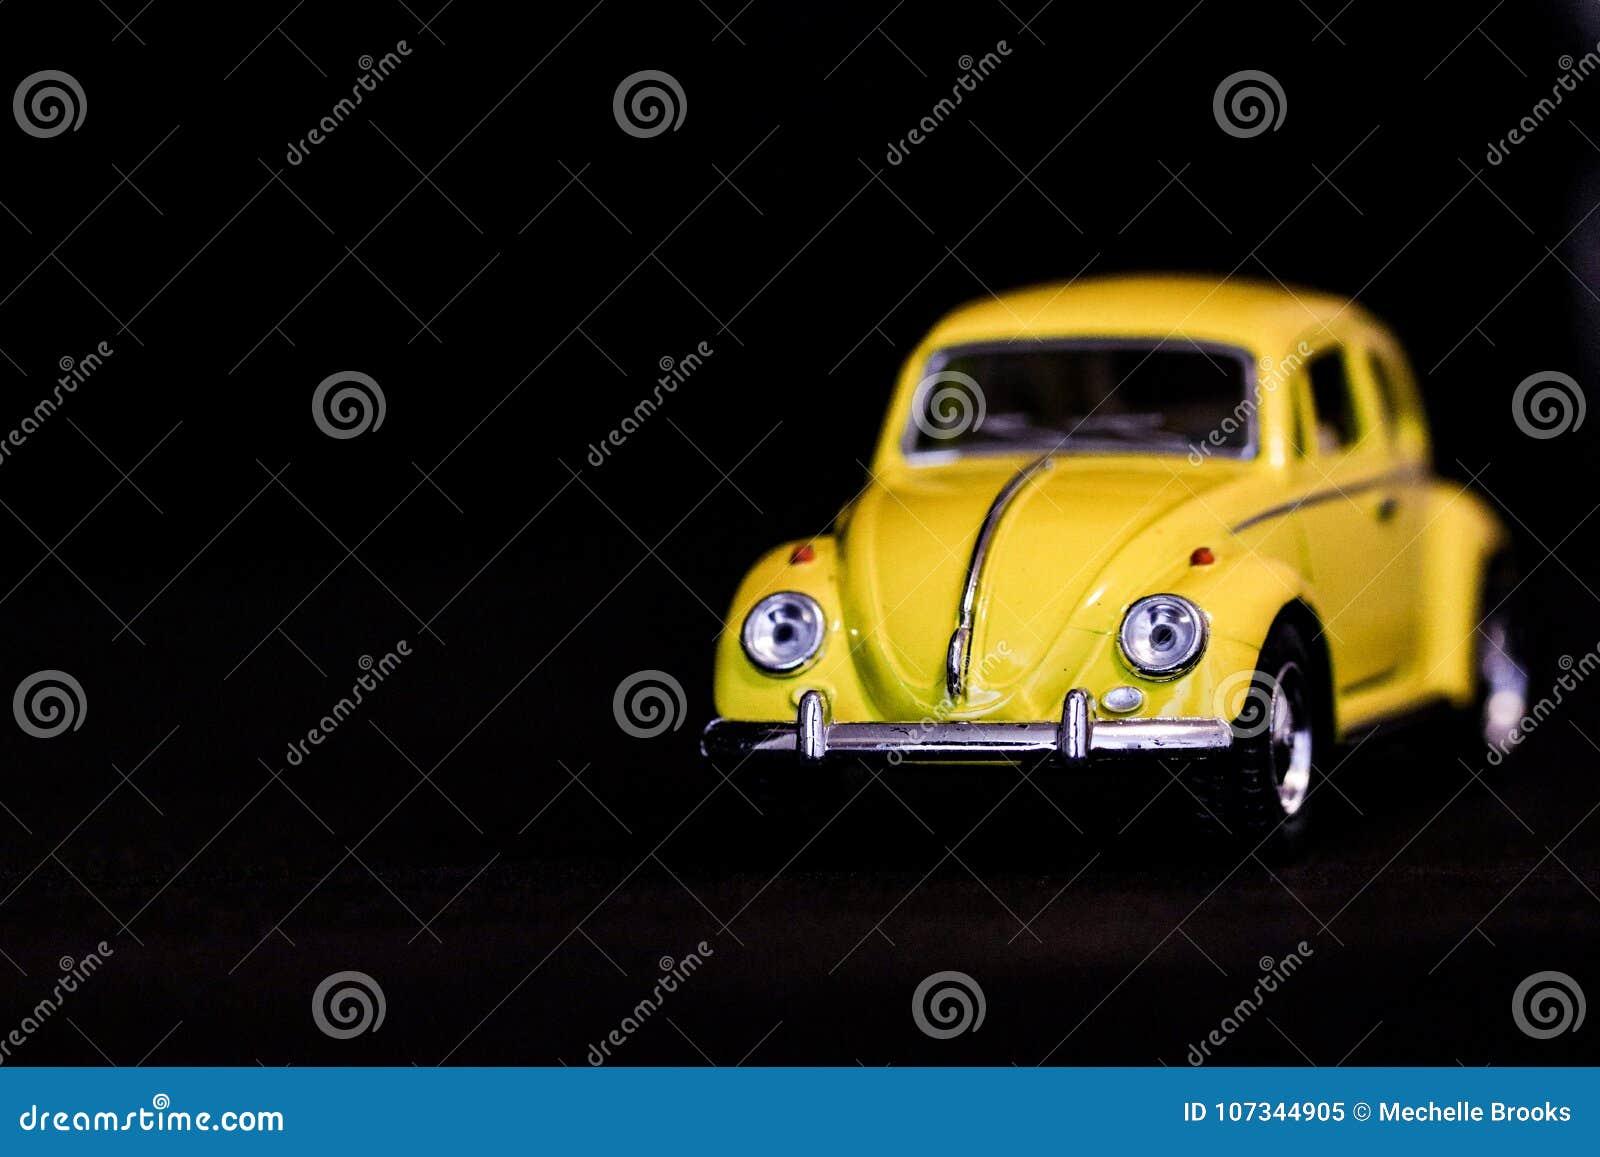 Voiture jaune minuscule